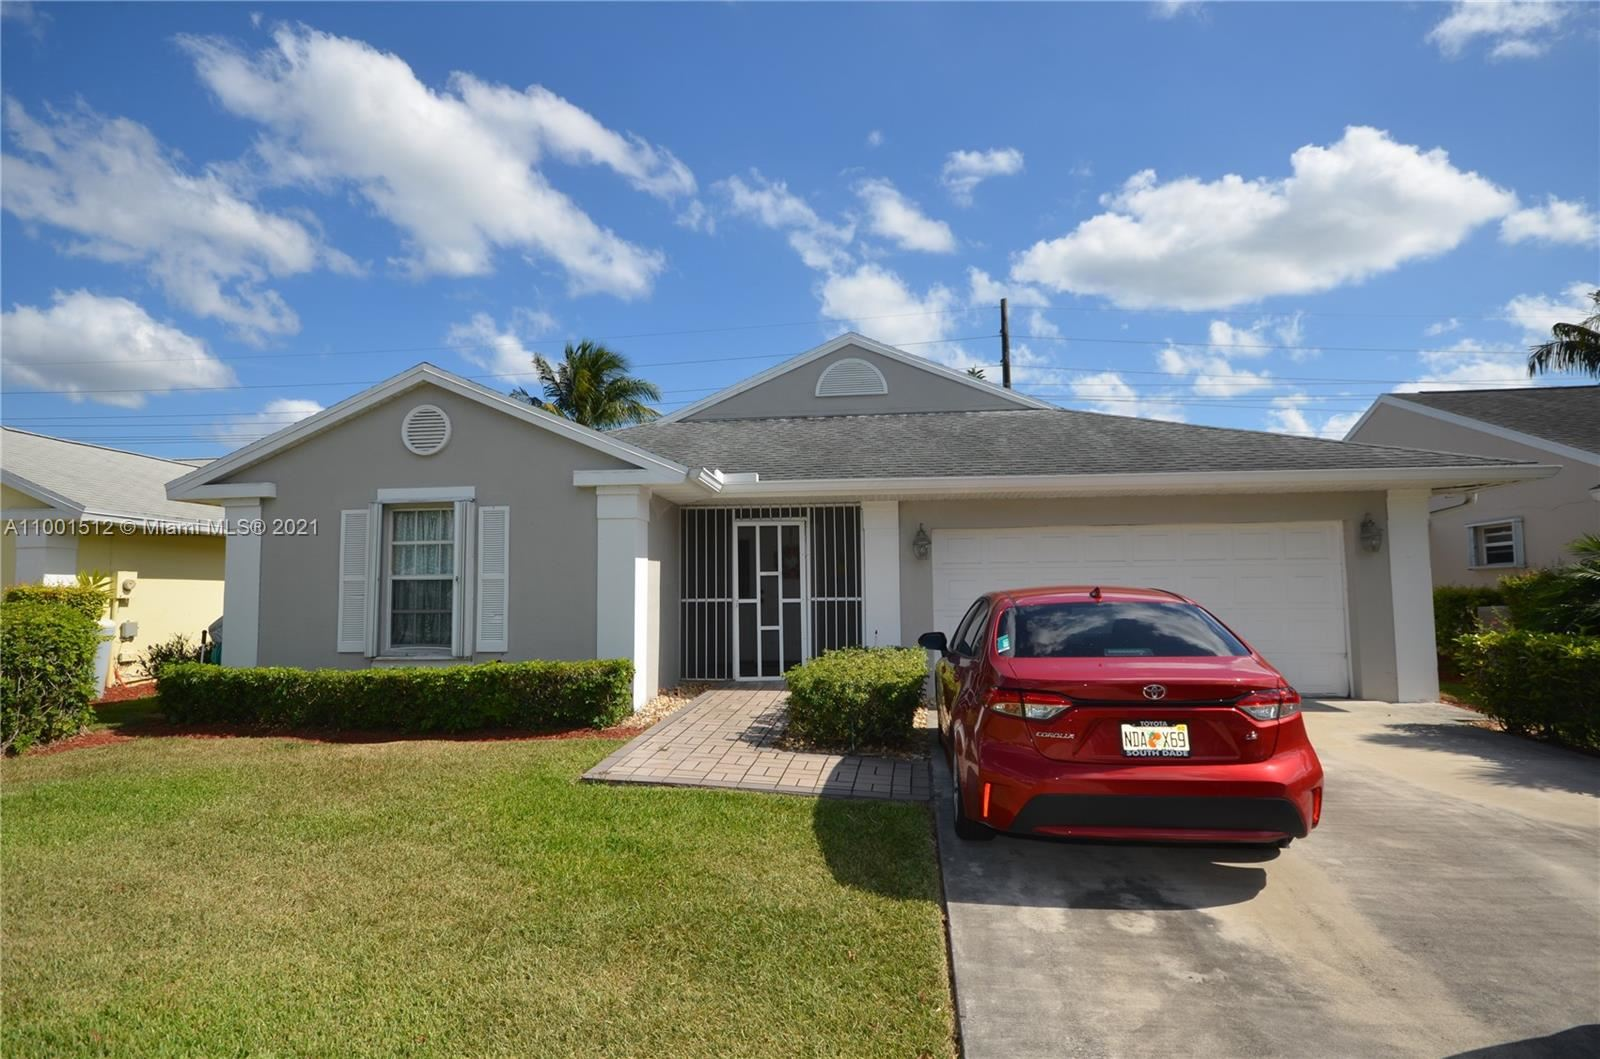 2730 SE 7th Pl, Homestead, FL 33033 - #: A11001512